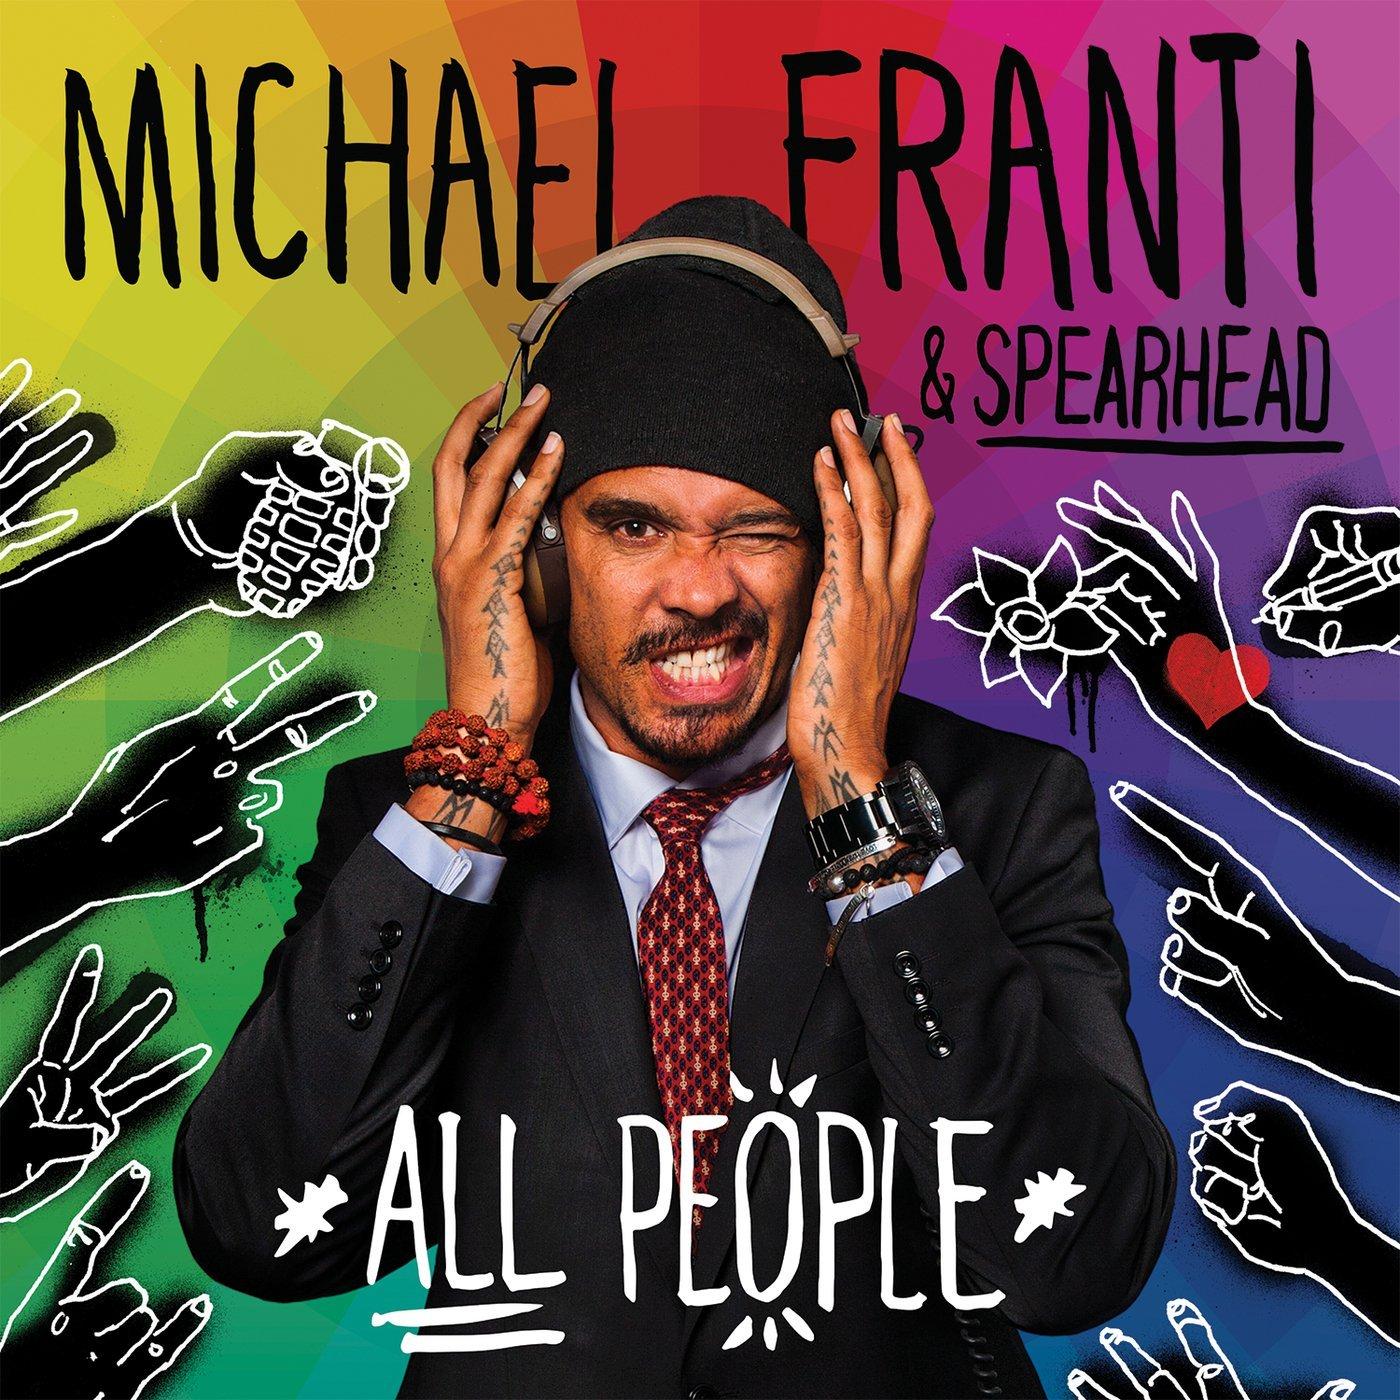 Franti_front_large